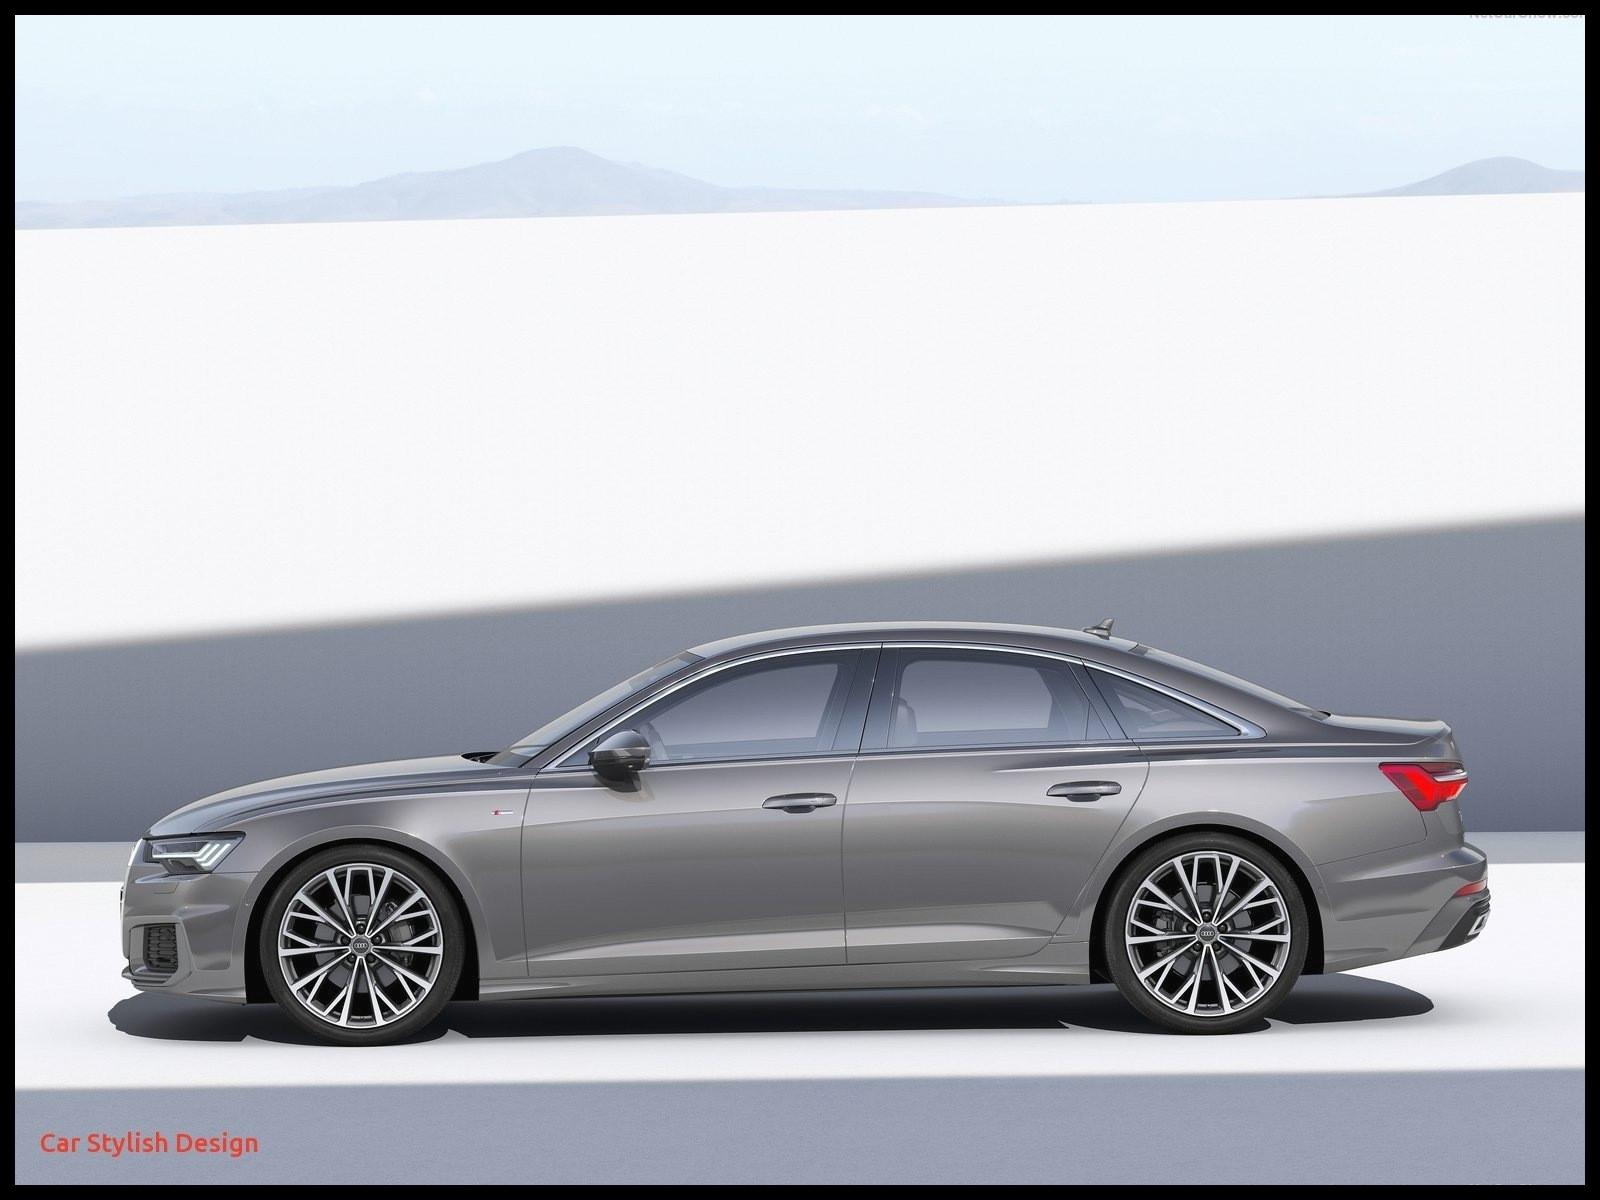 2019 Audi Q1 Ft Myers Audi New 2019 Audi Q1 Image – the Best Audi Car